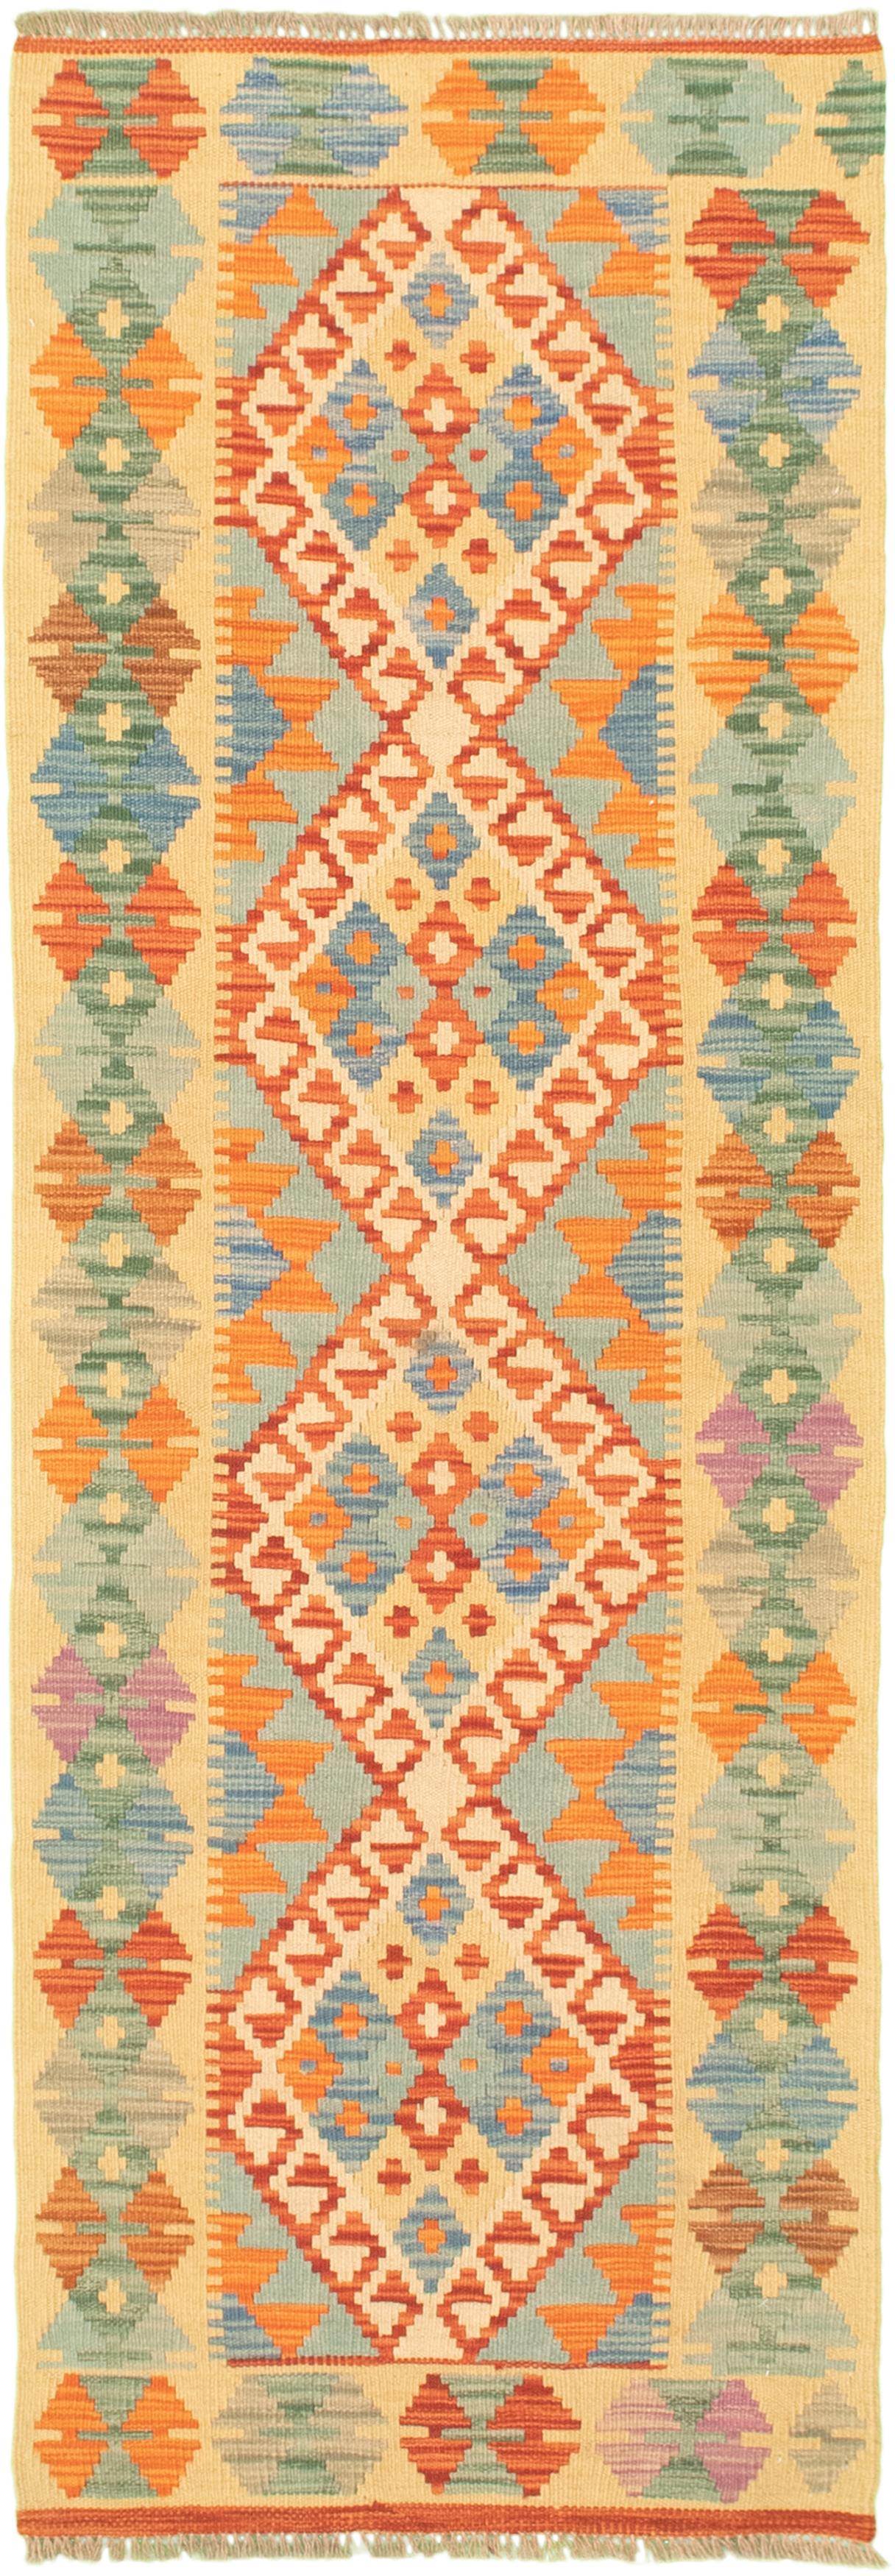 "Hand woven Bold and Colorful  Cream, Light Orange Wool Kilim 2'1"" x 6'5"" Size: 2'1"" x 6'5"""